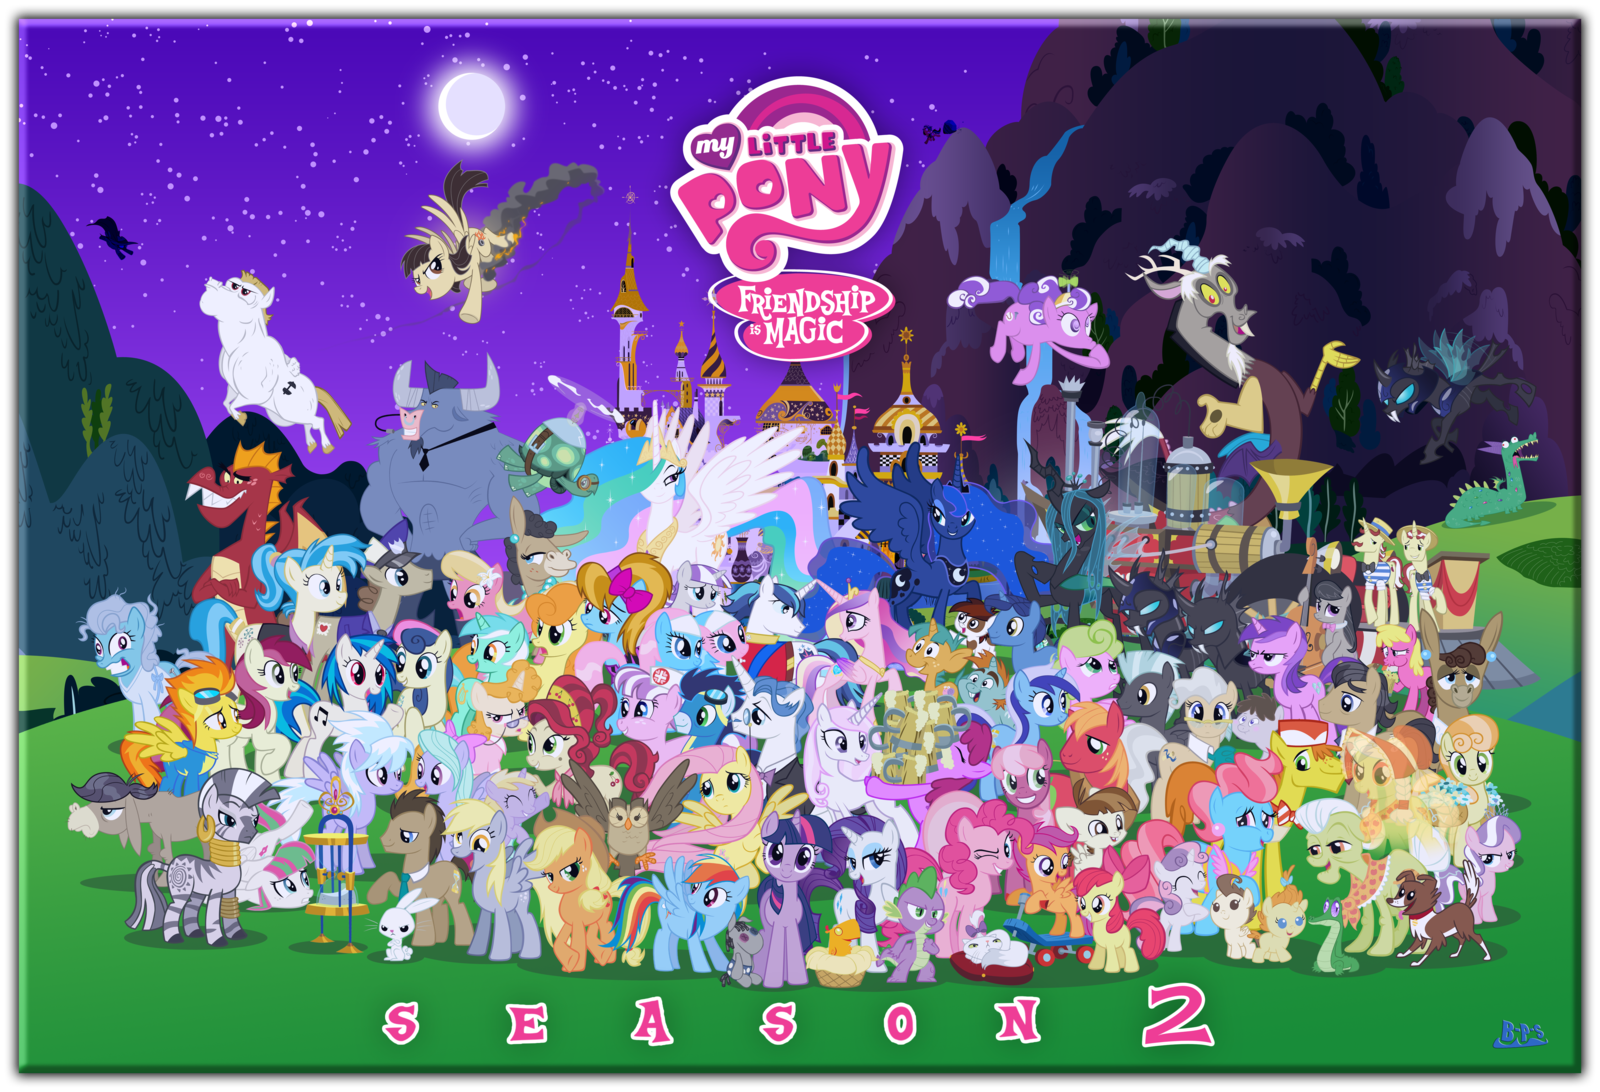 Castle Mane Ia My Little Pony Friendship Is Magic Wiki >> I Ve Reached My Goal My Little Pony My Little Pony Friendship